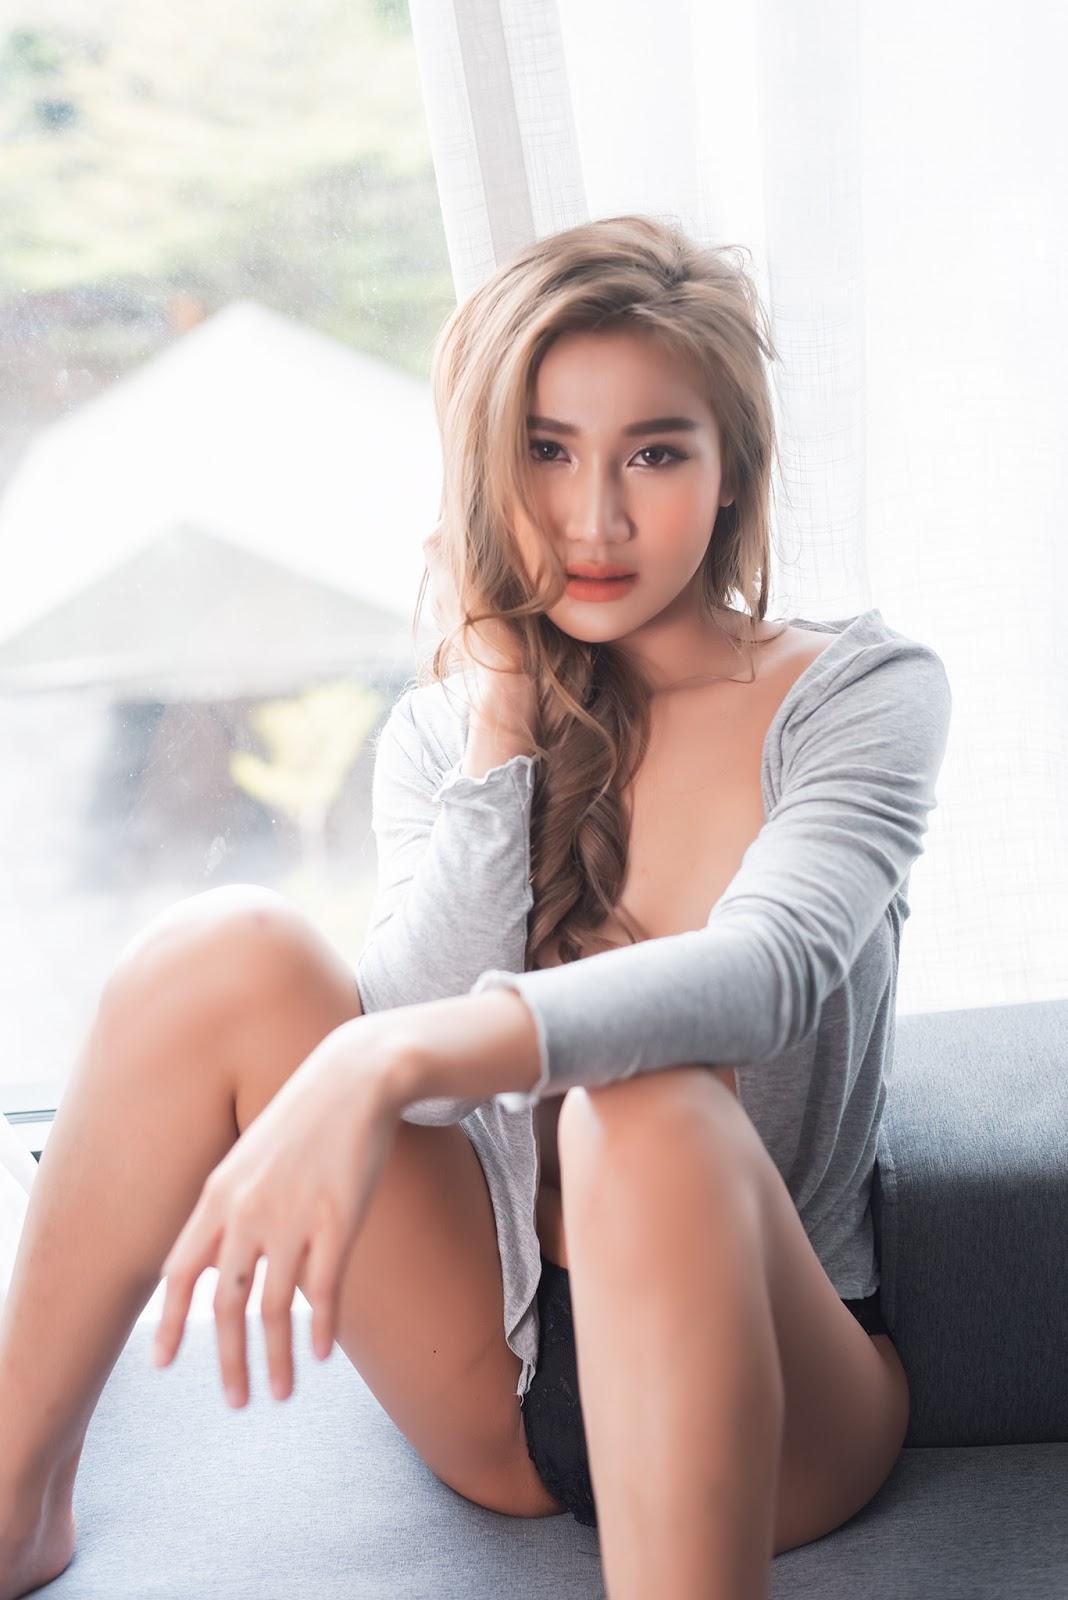 Thailand Beautyful Girl Pic No.297 || MiKu Muay